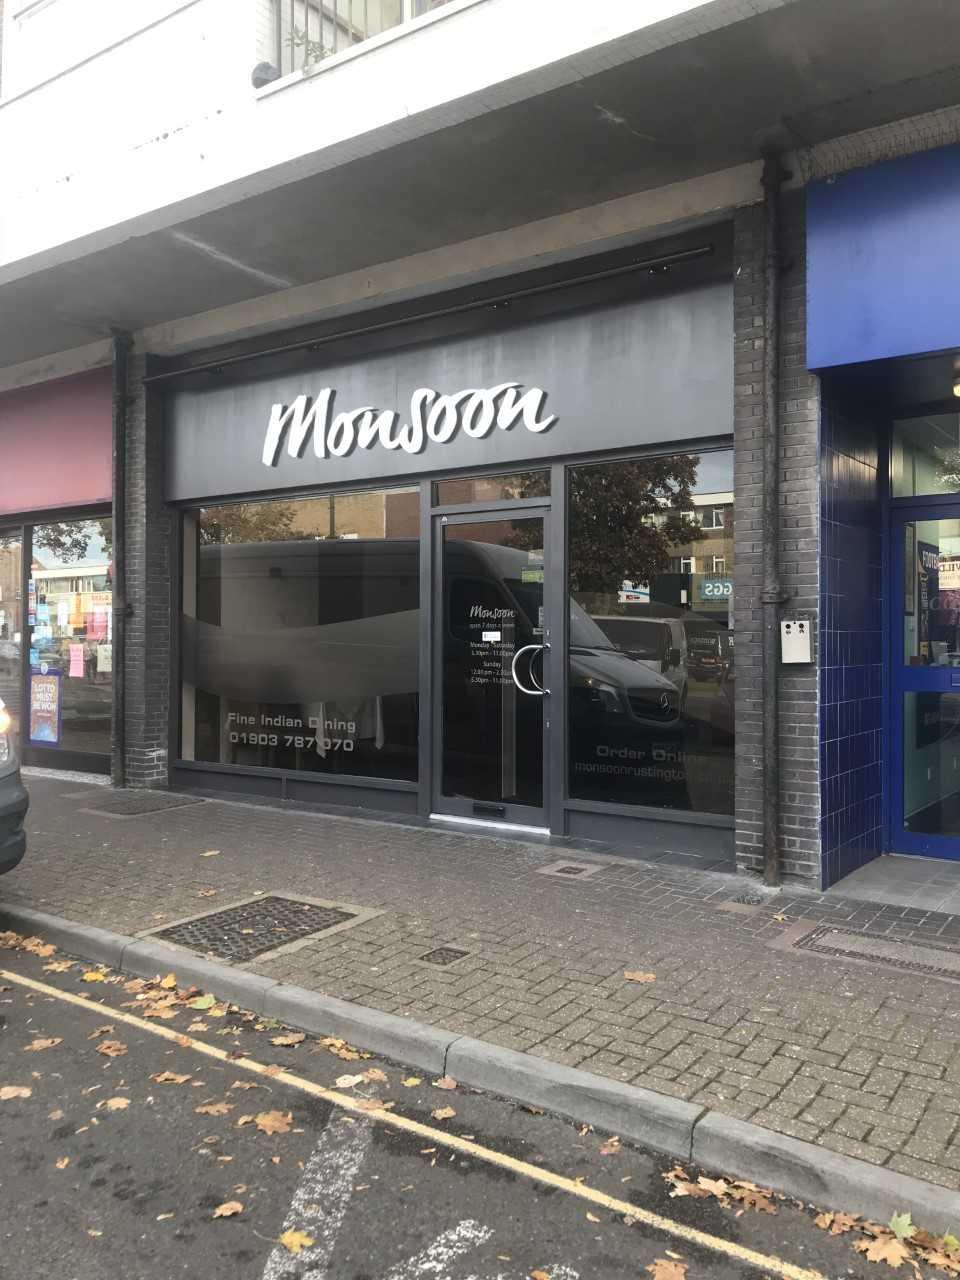 Monsoon Indian Restaurant in Rustington